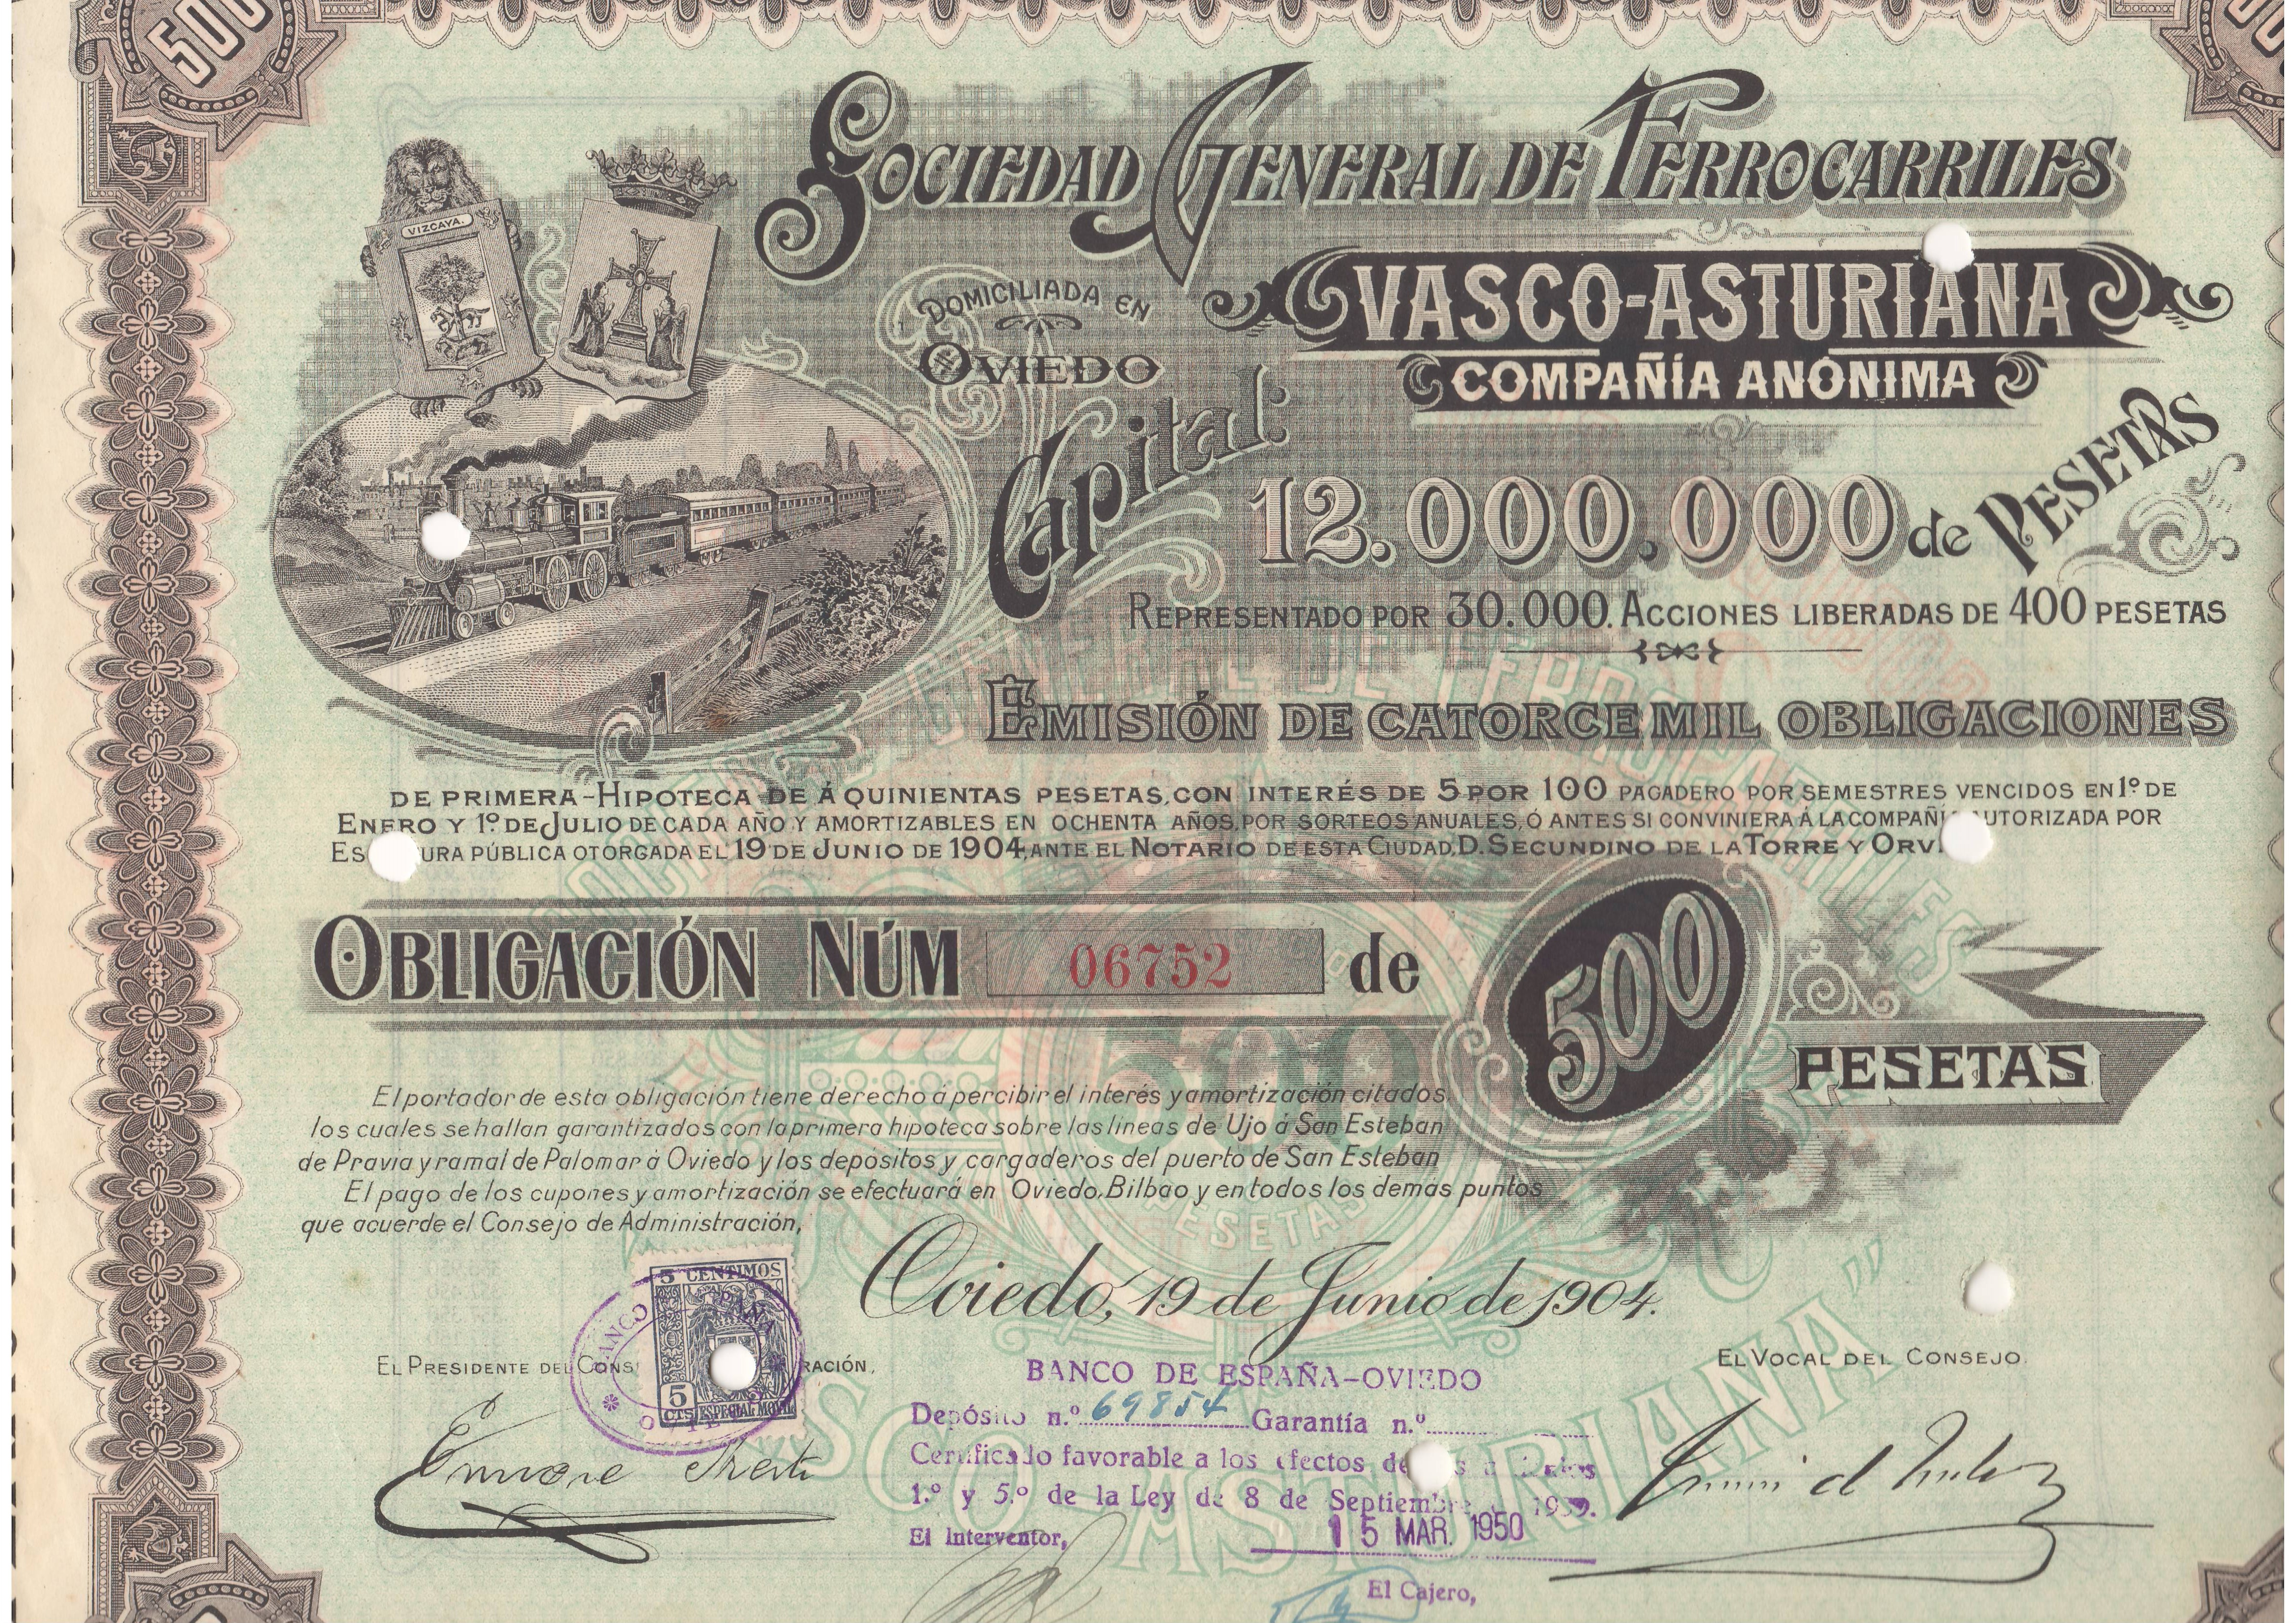 Sociedad General de Ferrocarriles Vasco-Asturiana